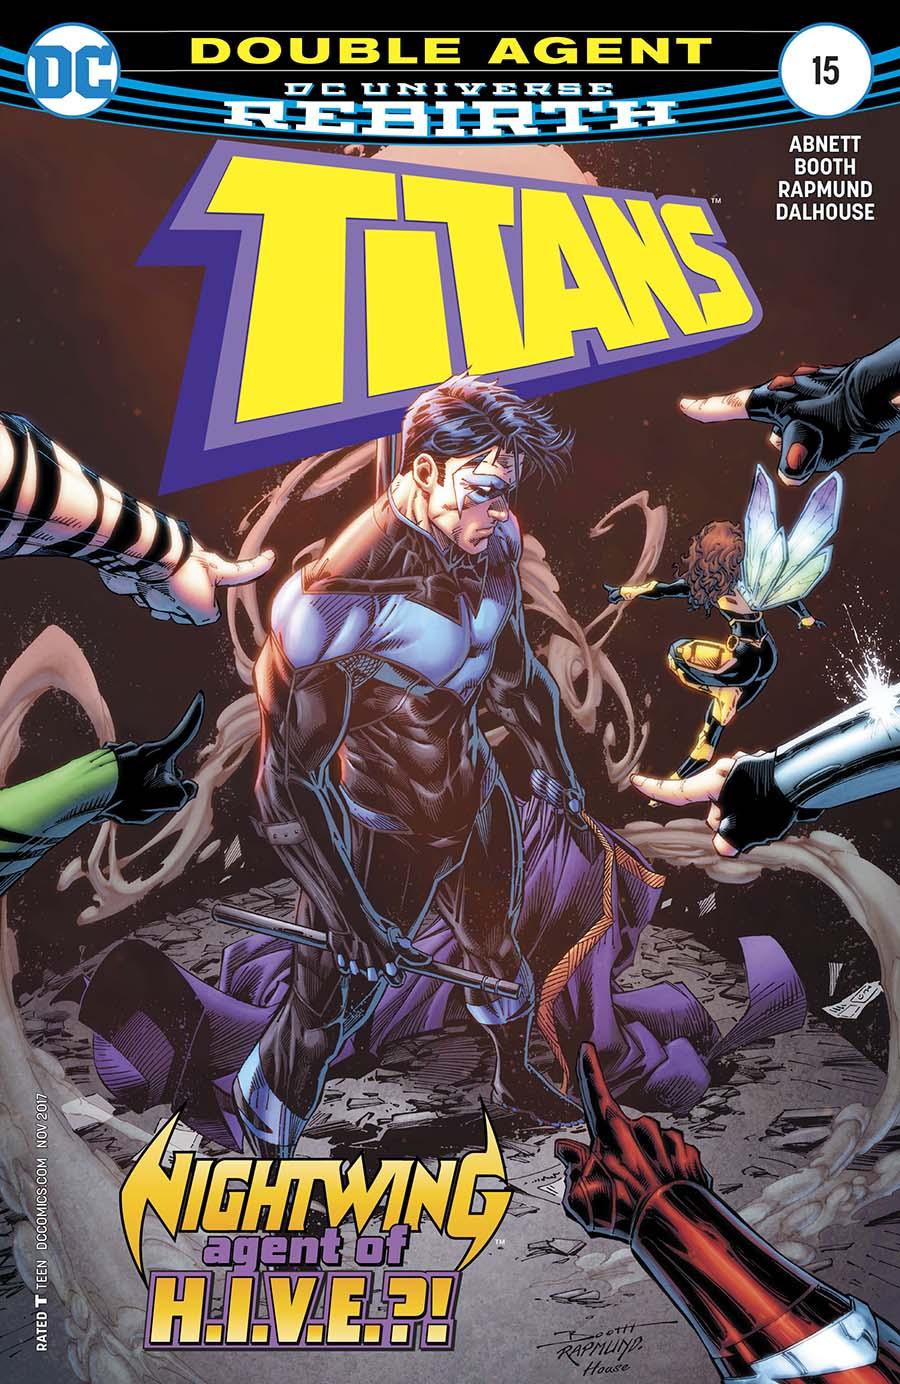 Titans Vol 3 #15 Cover A Regular Brett Booth & Norm Rapmund Cover